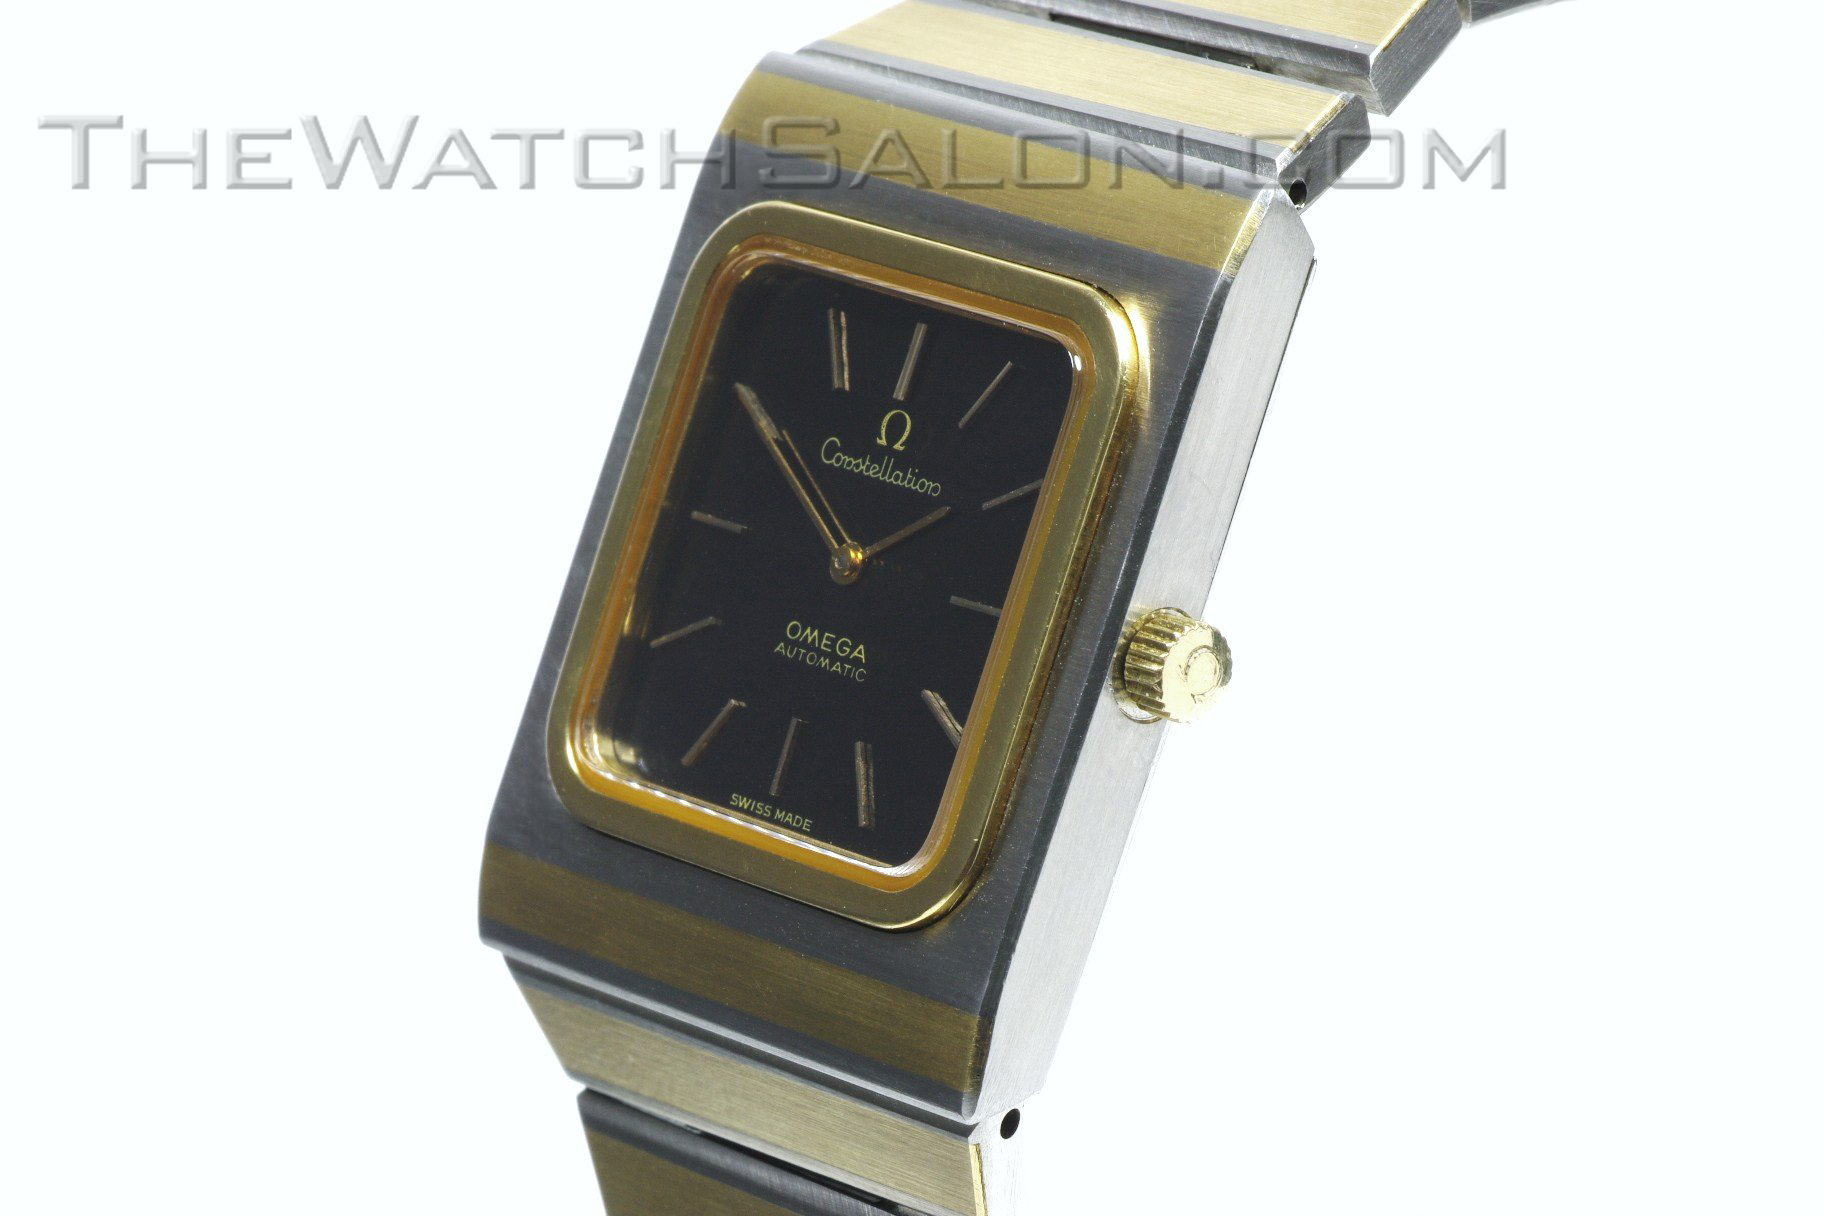 Omega 14k gold Constellation 2000 - 1975 o1 crown